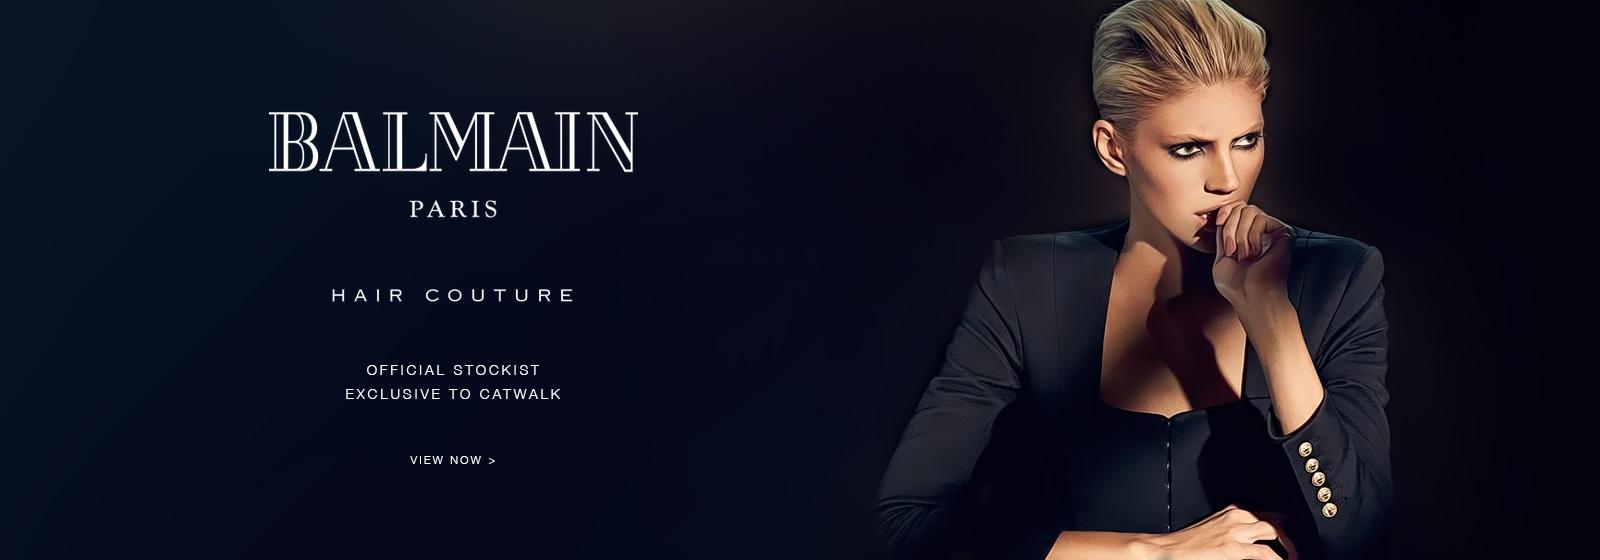 Balmain Paris - Hair Couture Now Available